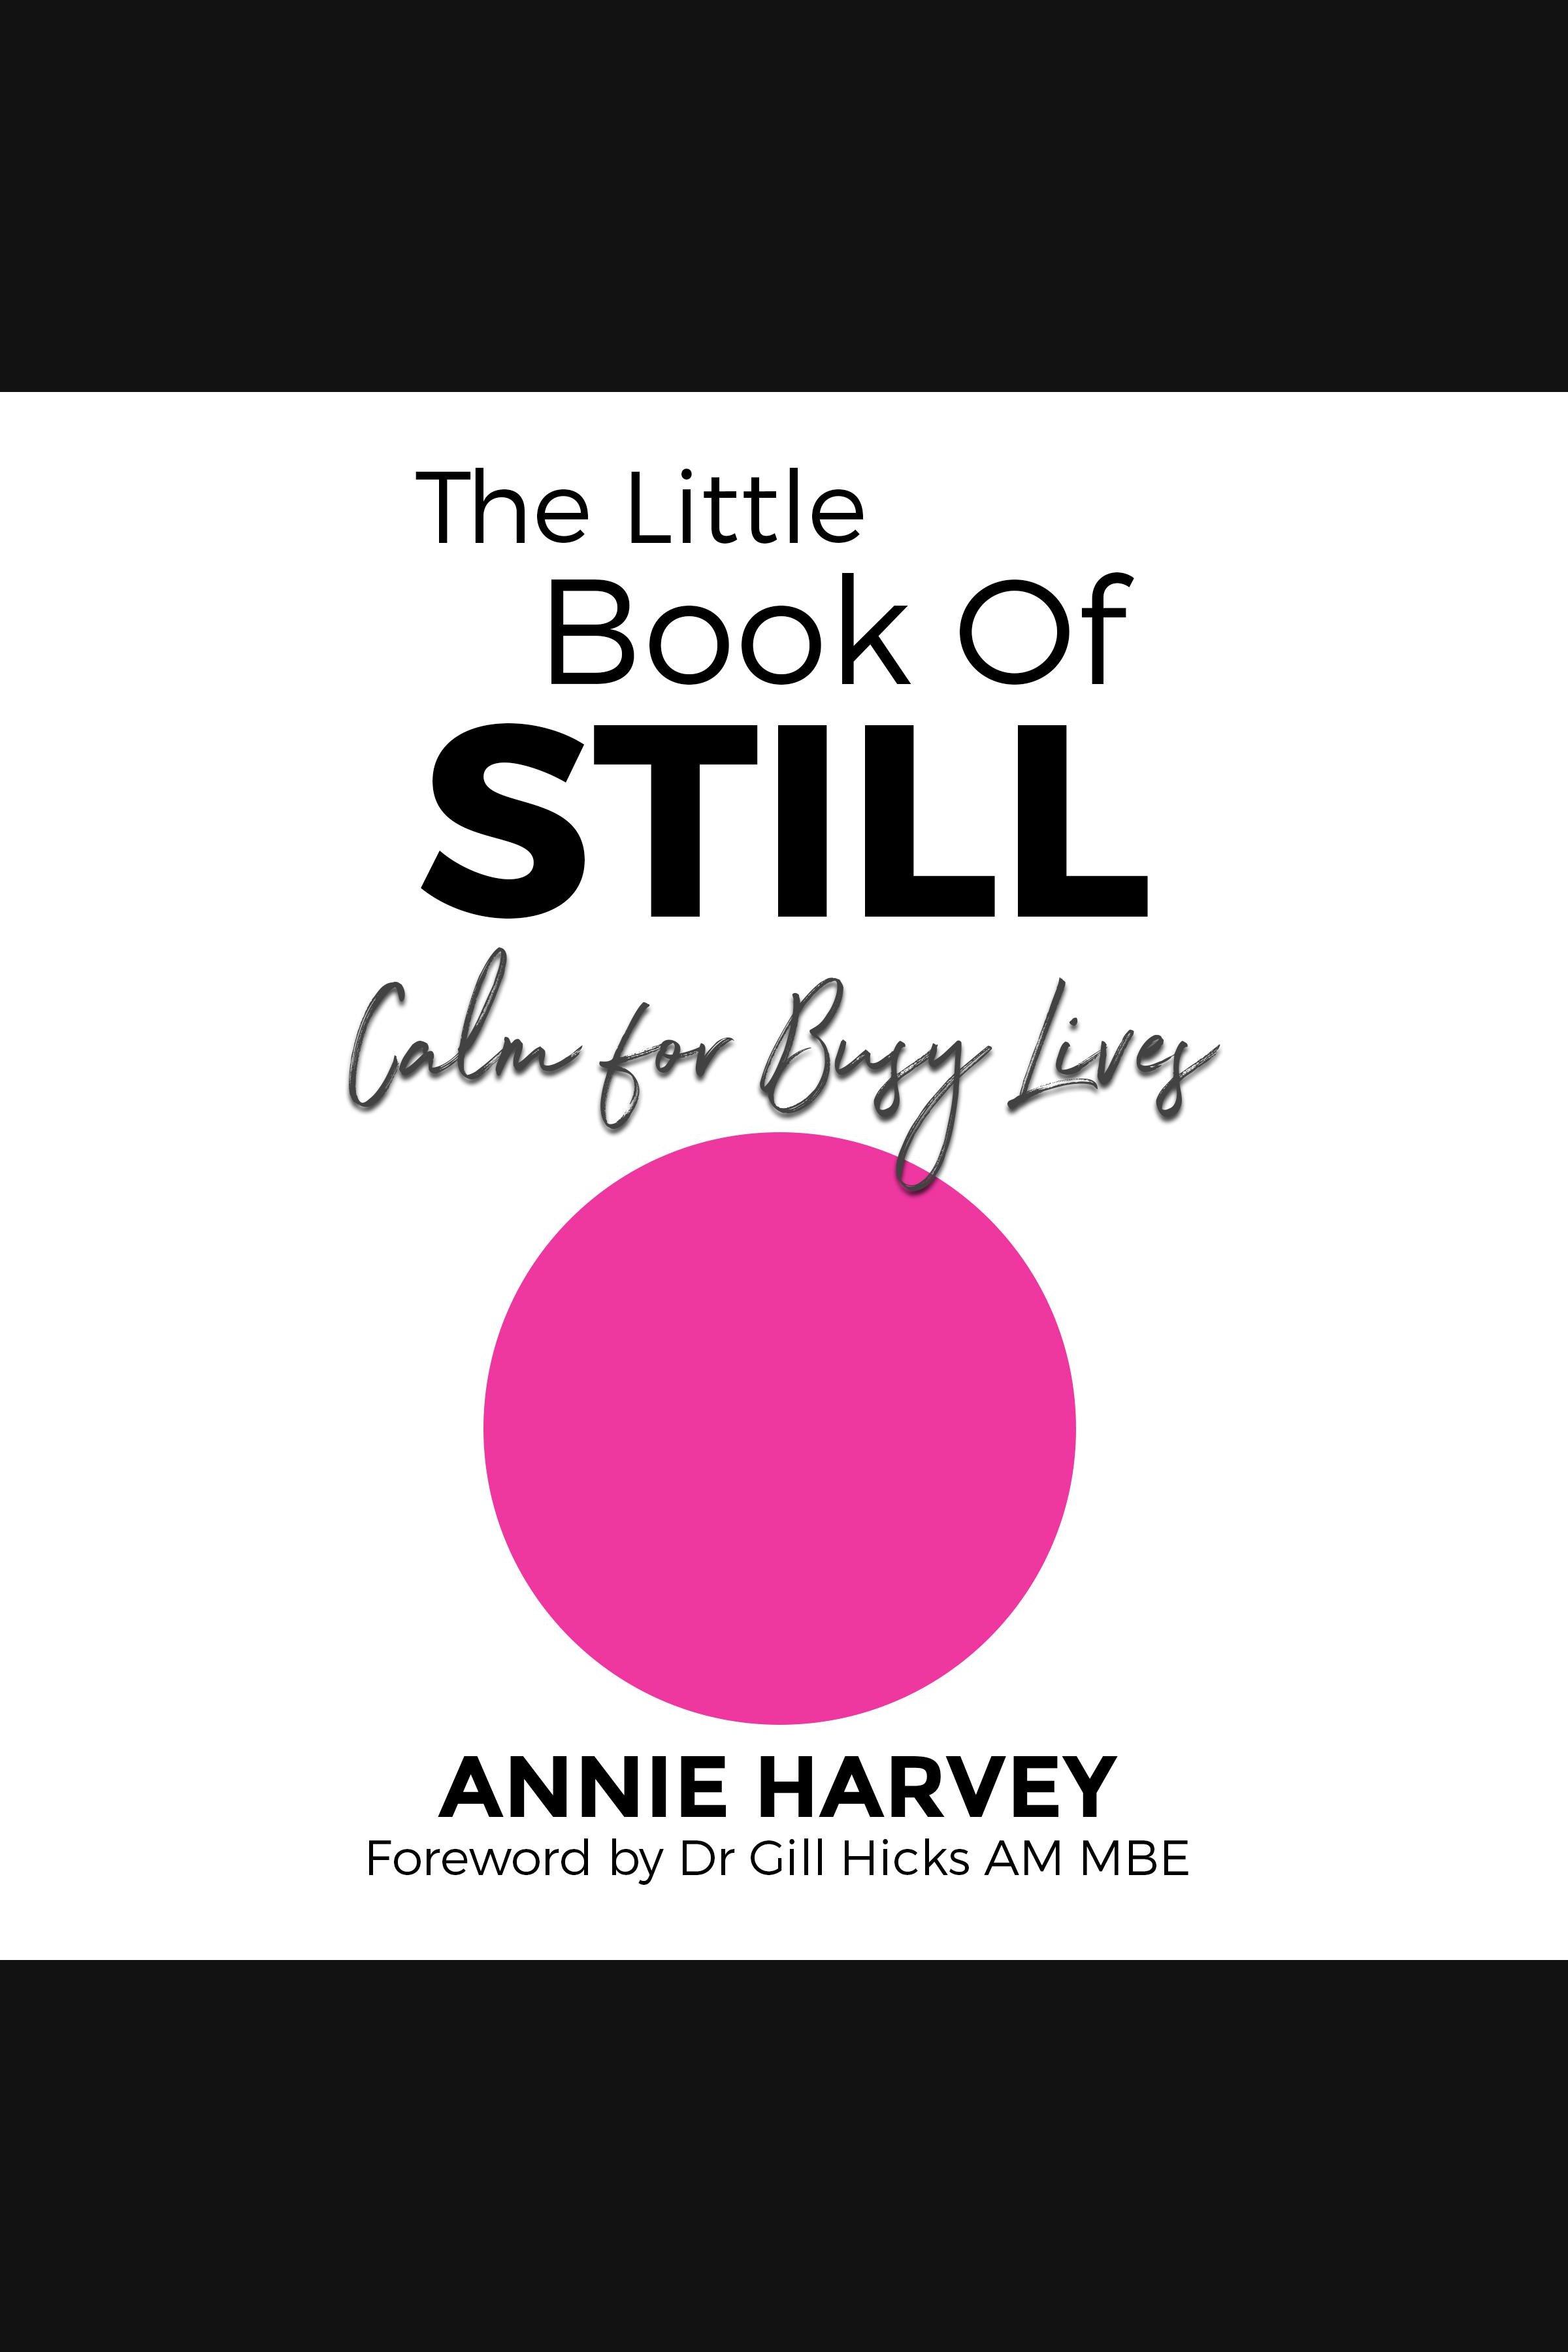 Esta es la portada del audiolibro Little Book of Still, The